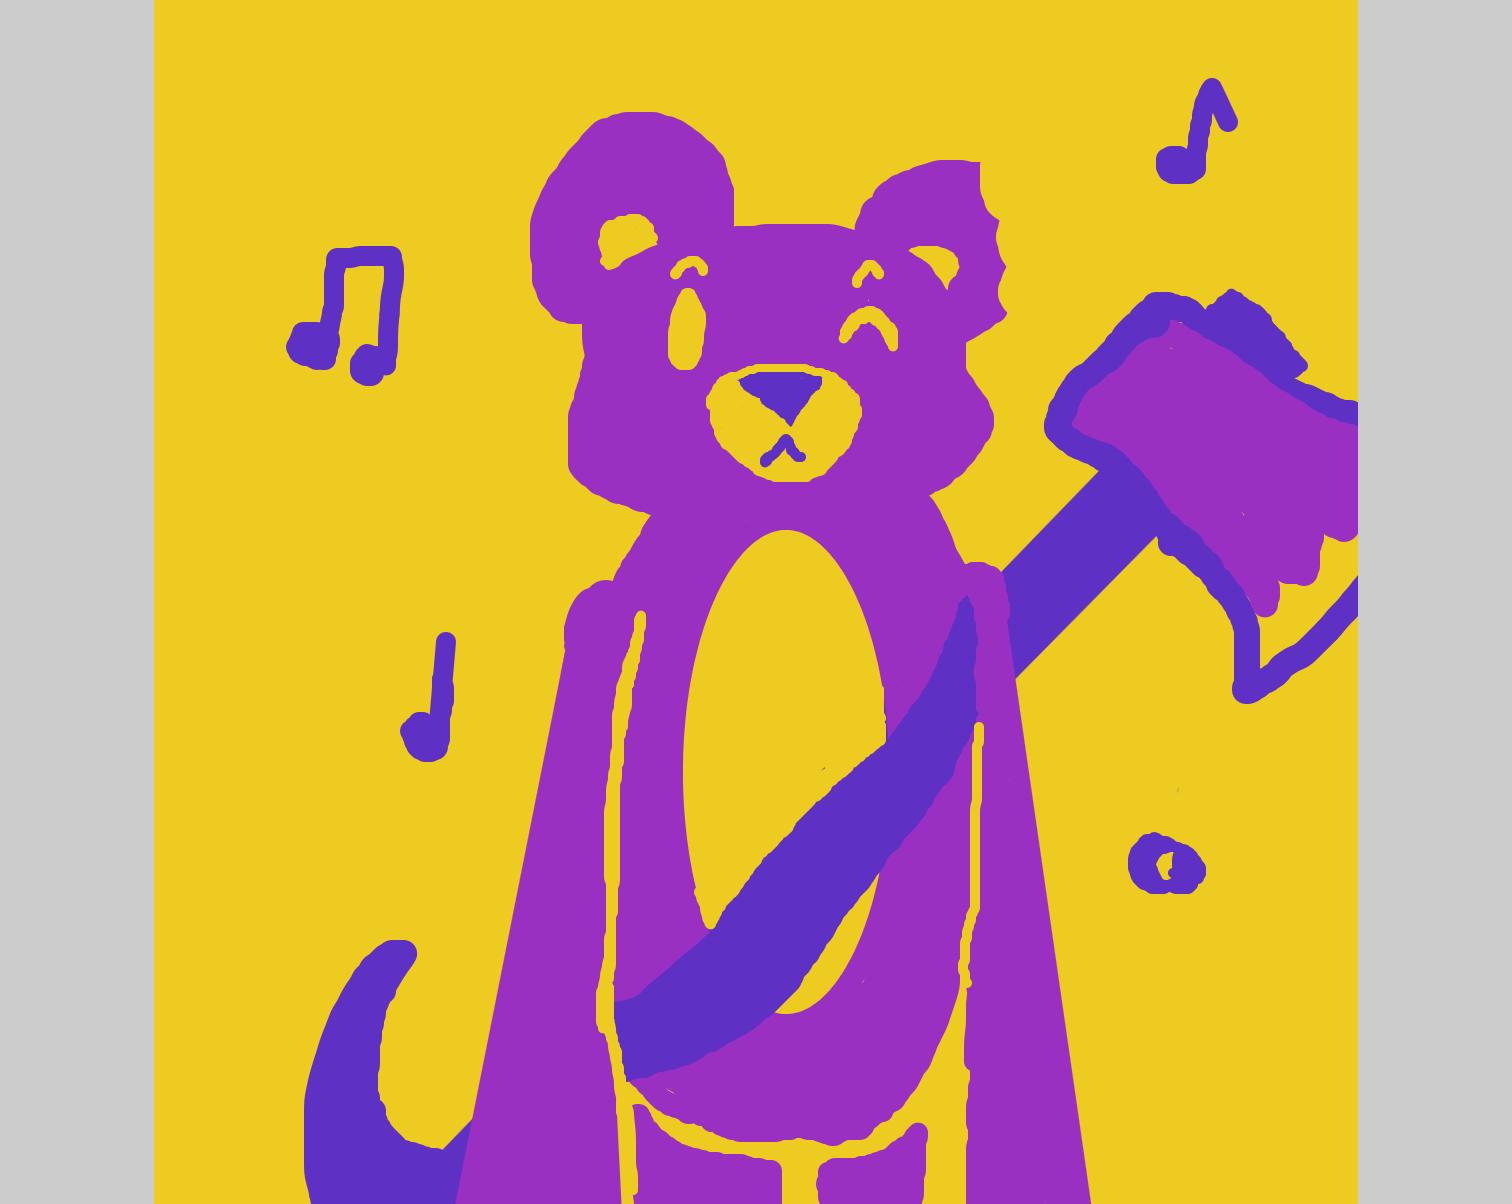 Drawing in 3 colors jam by LizardPie34